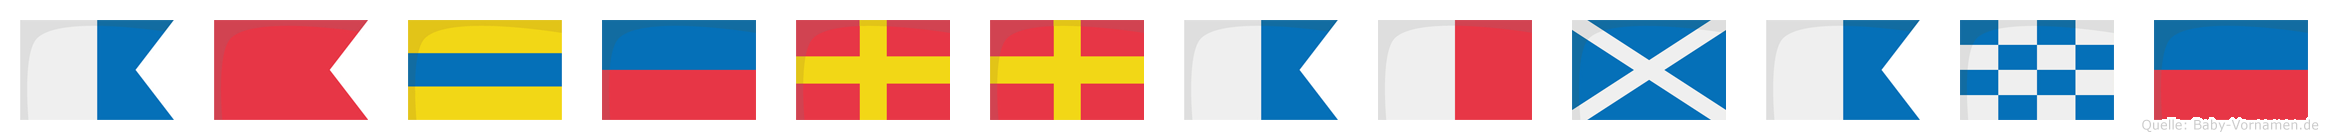 Abderrahmane im Flaggenalphabet